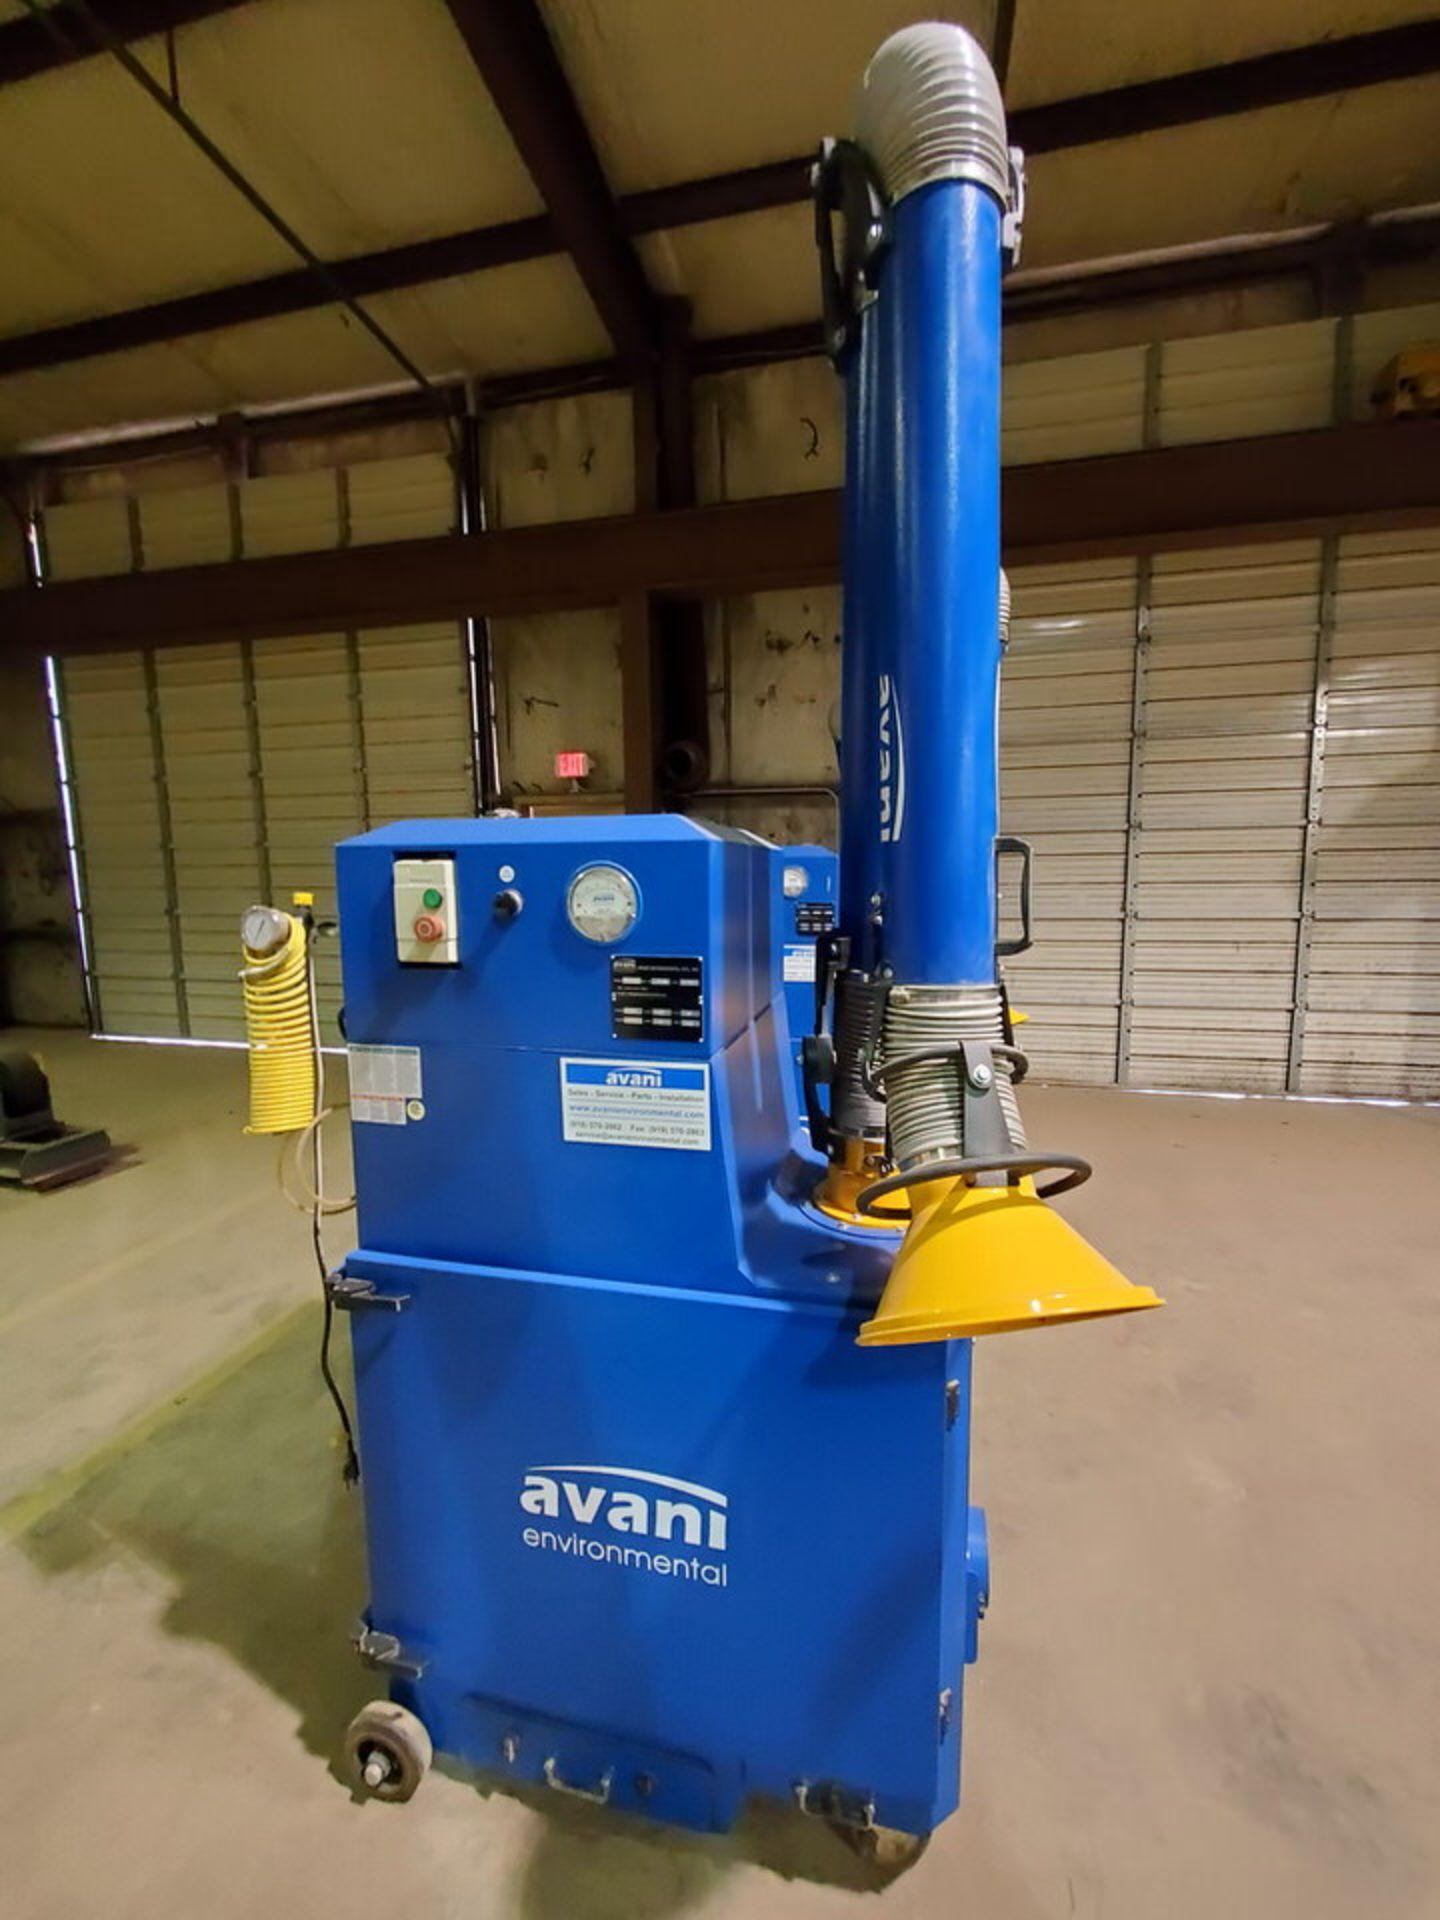 2017 Avanti SPC-2000 Portable Dust Collector 1-1/2HP, 120V, 60HZ, 1PH, 14A, 3450RPM - Image 5 of 7